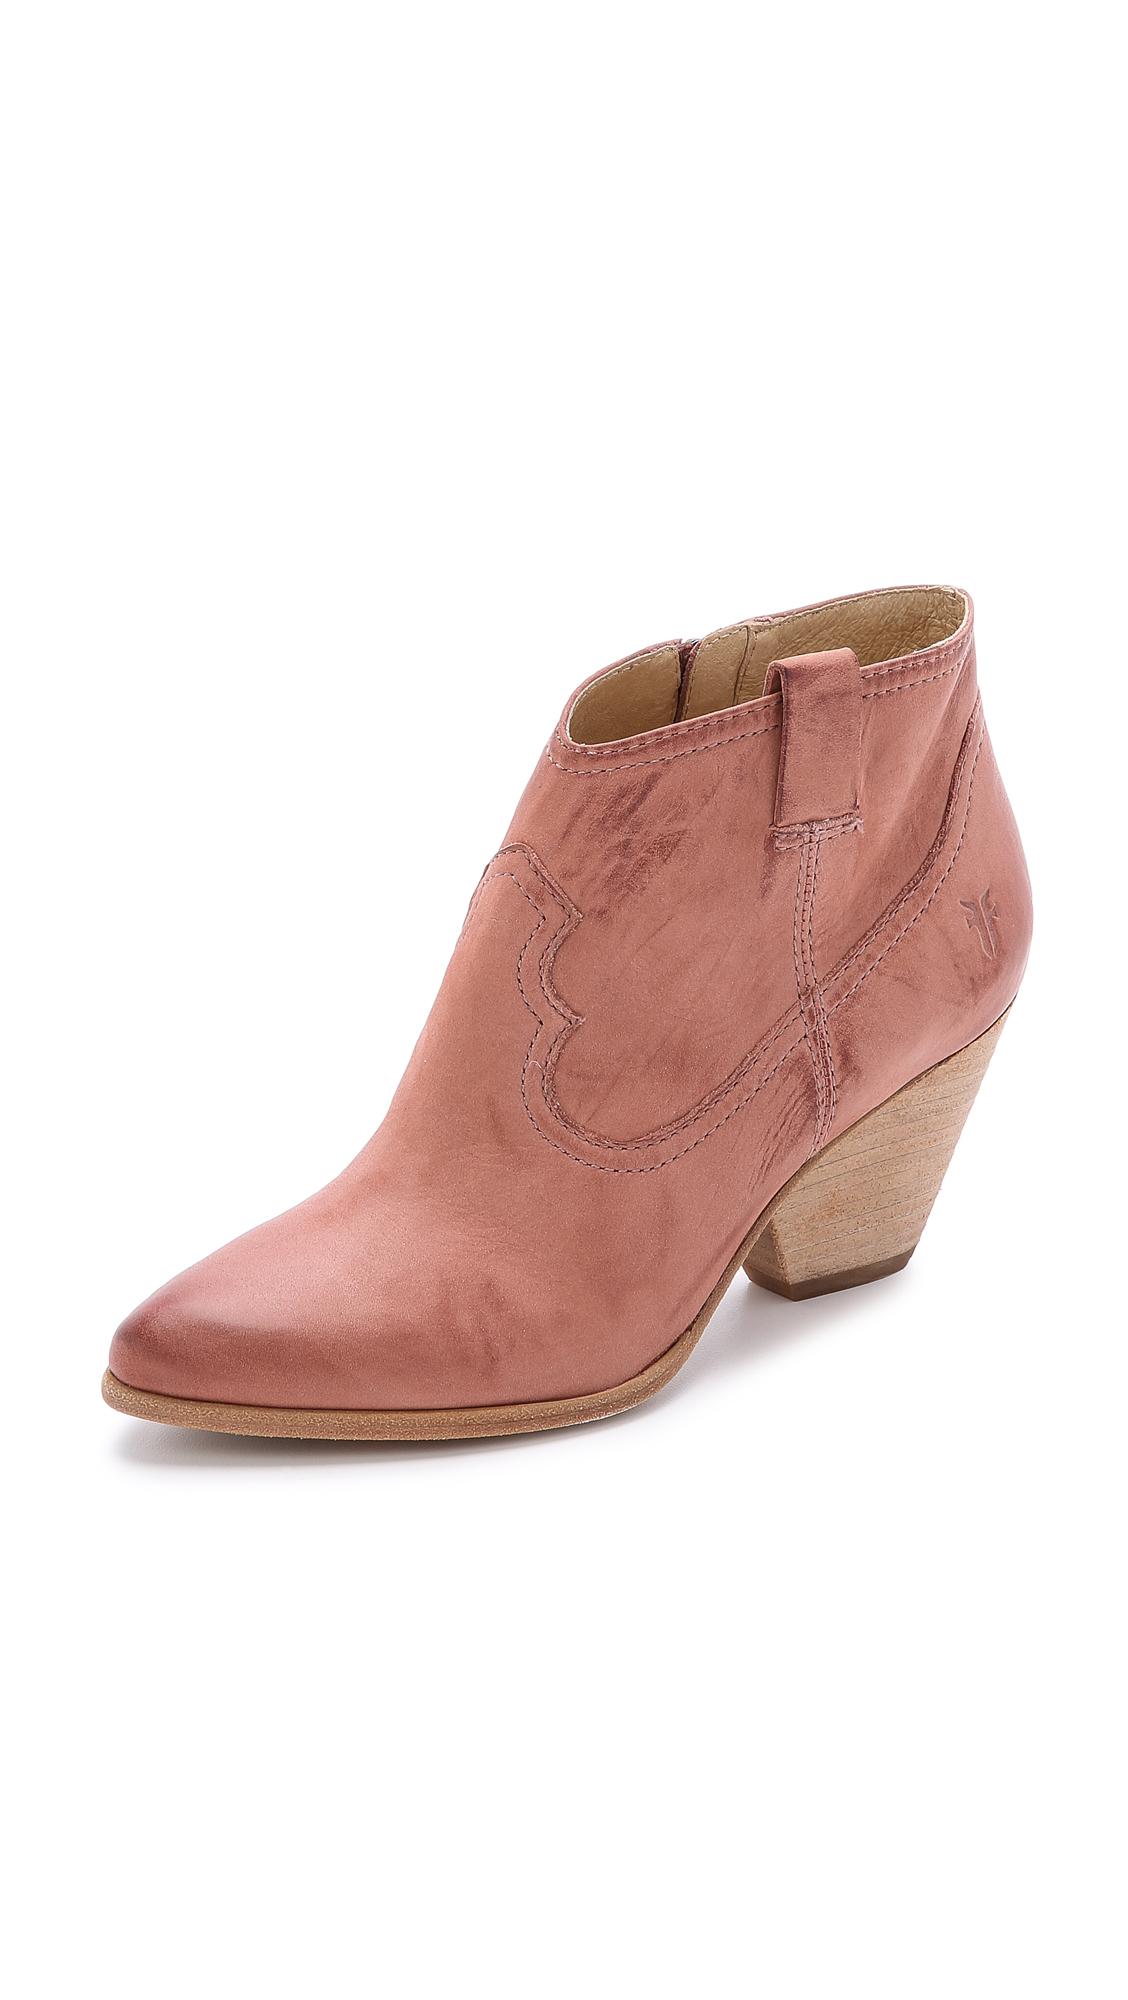 Lyst Frye Reina Booties Dusty Rose In Pink